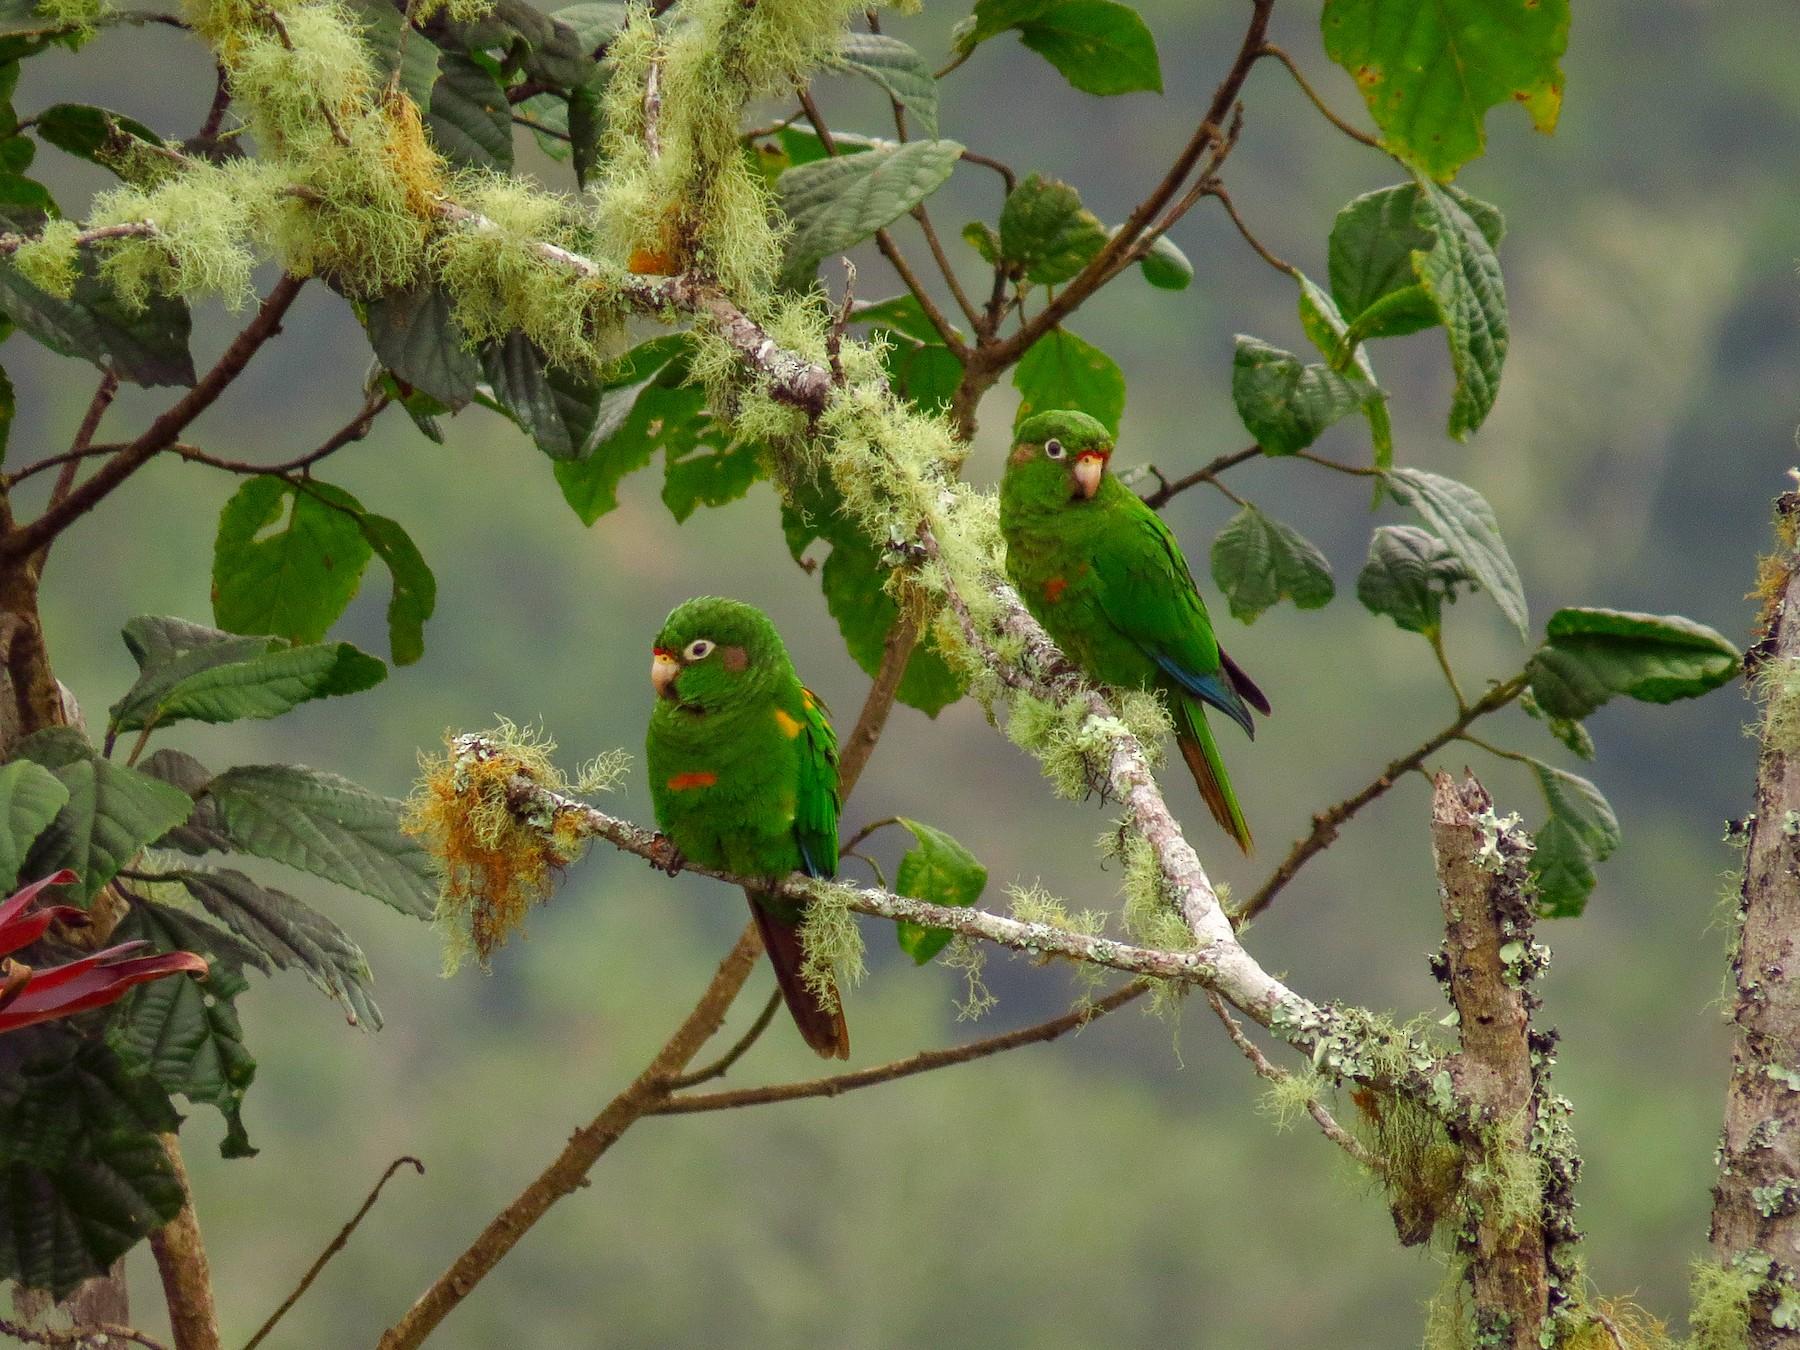 Santa Marta Parakeet - Jorge Muñoz García   CAQUETA BIRDING